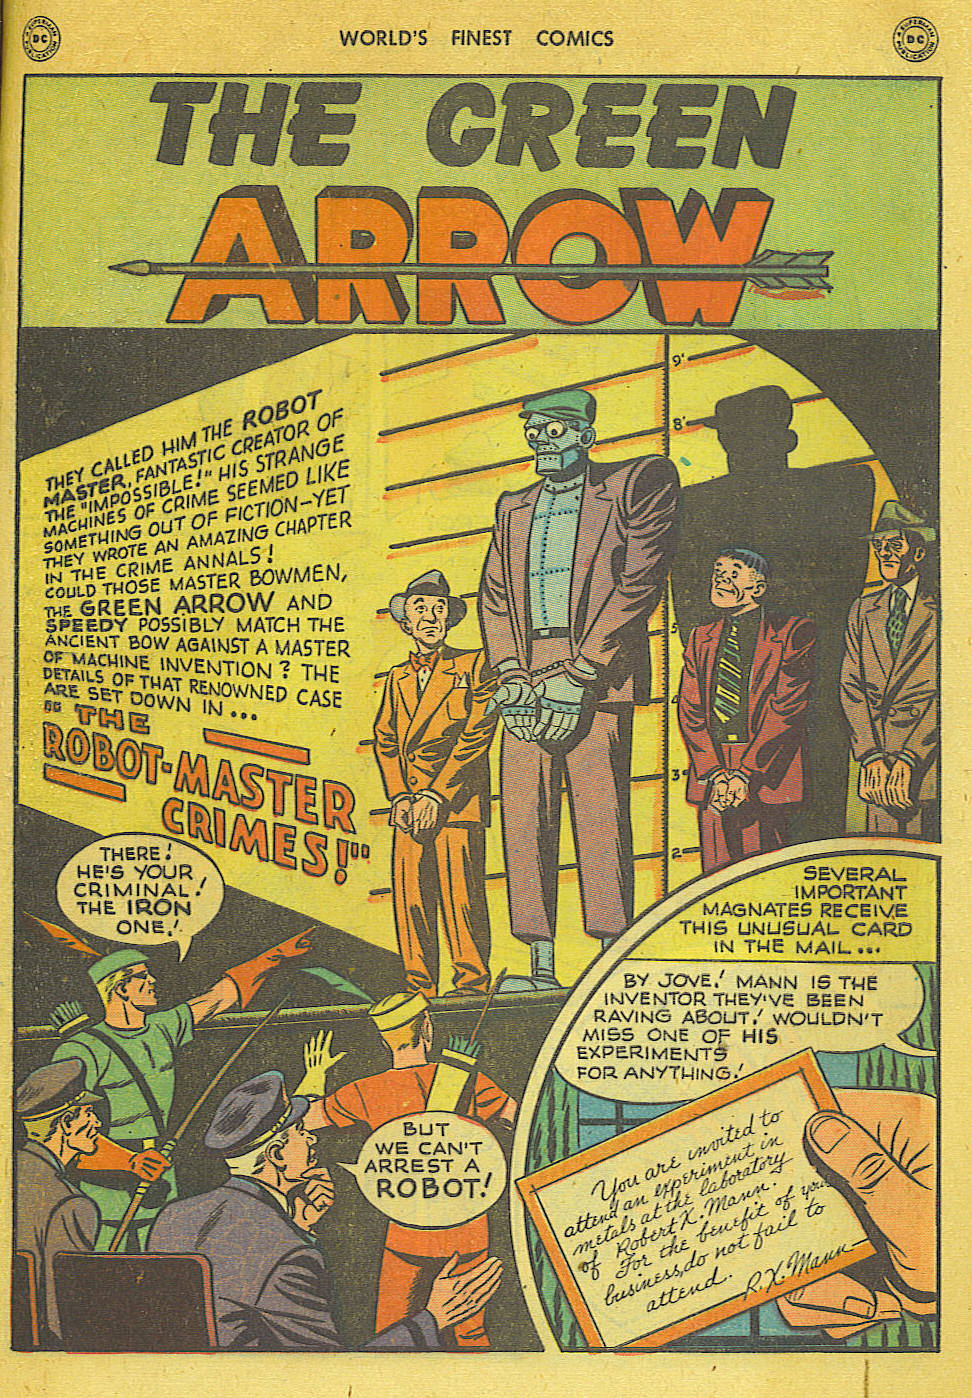 Read online World's Finest Comics comic -  Issue #34 - 41